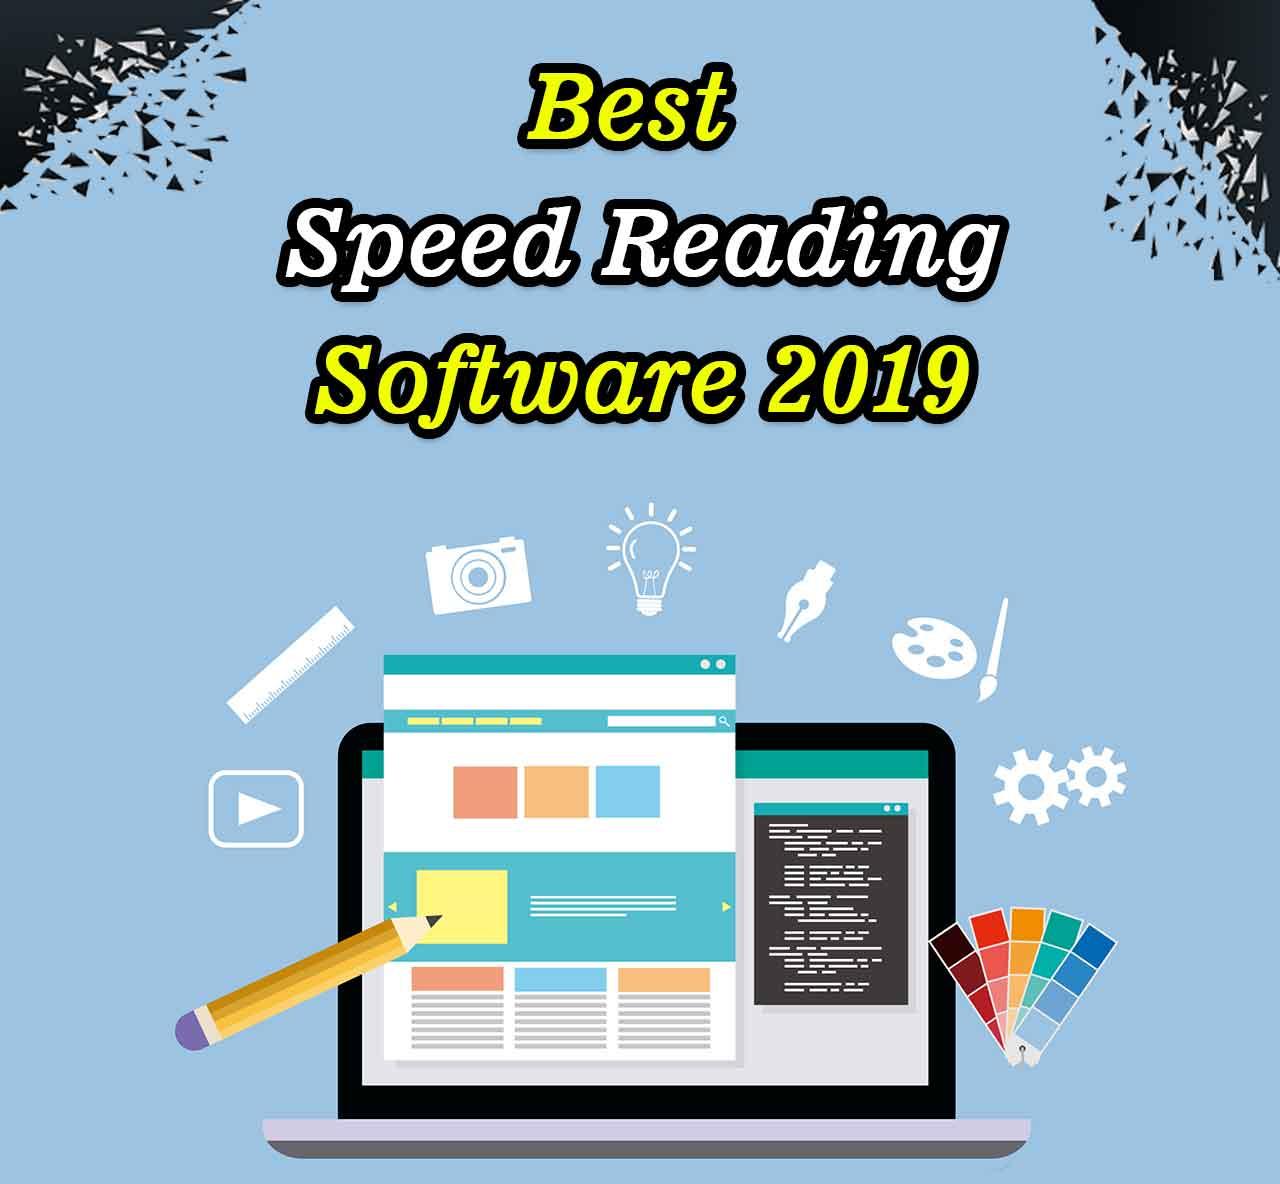 9 Best Speed Reading Software in 2019